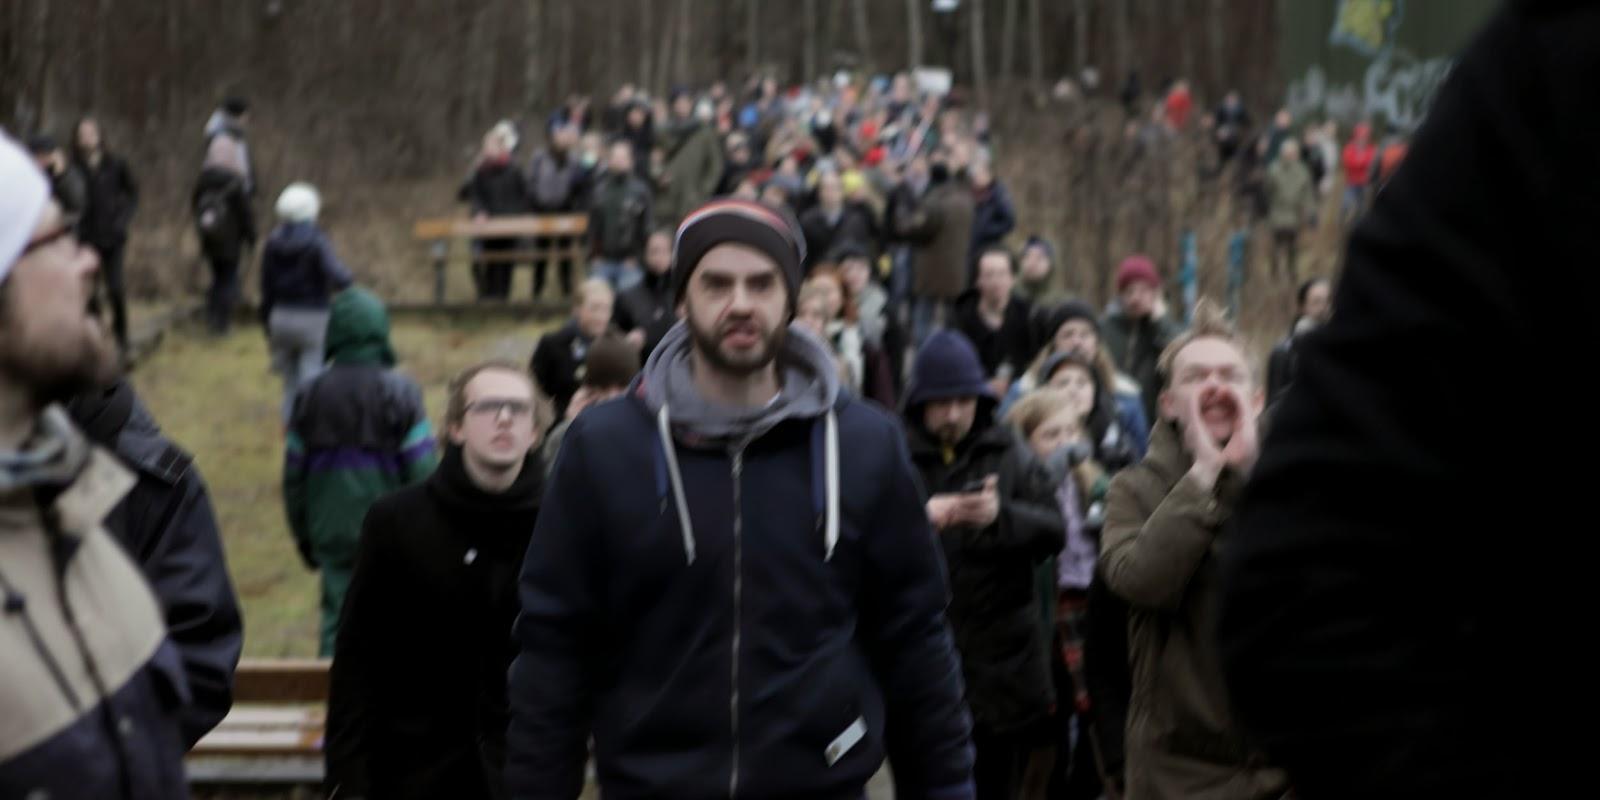 Reva protest samlade hundratals